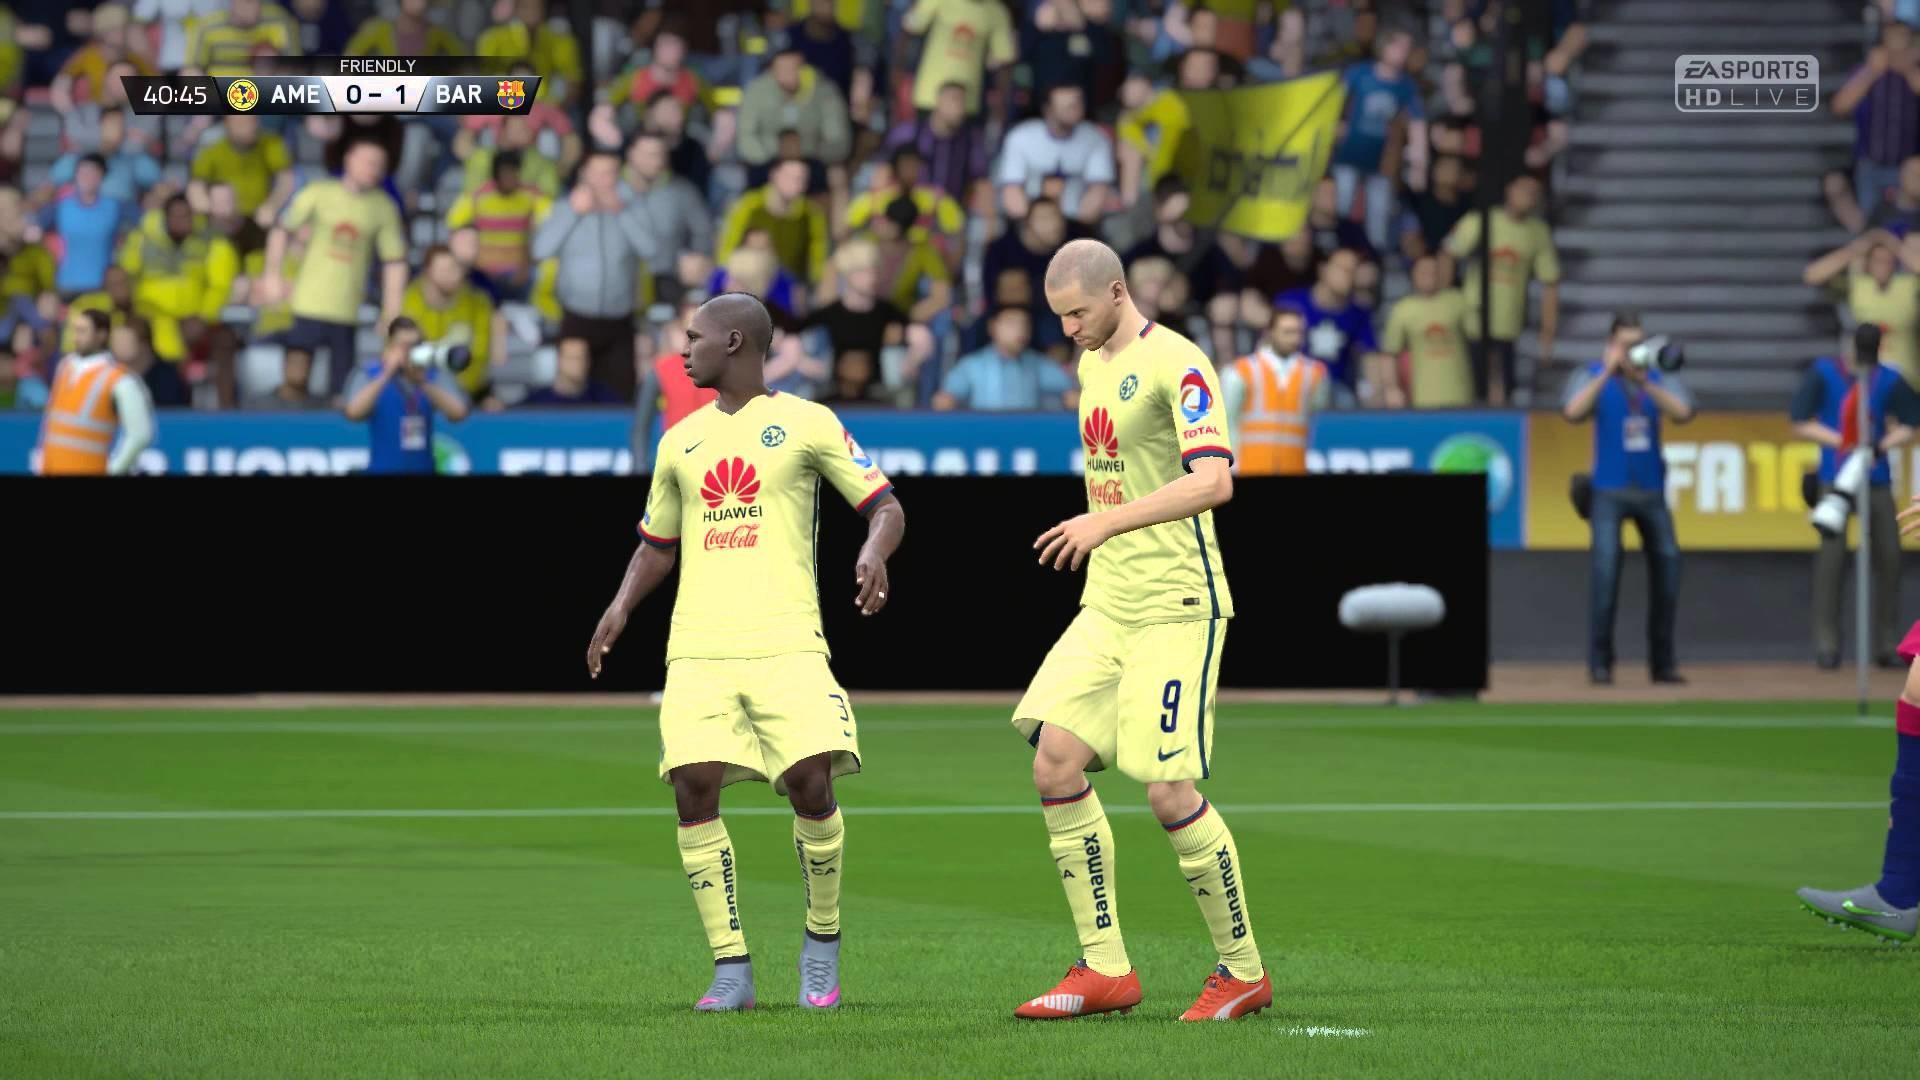 FIFA 16 – Club America vs. FC Barcelona Gameplay [1080p / 60 FPS]